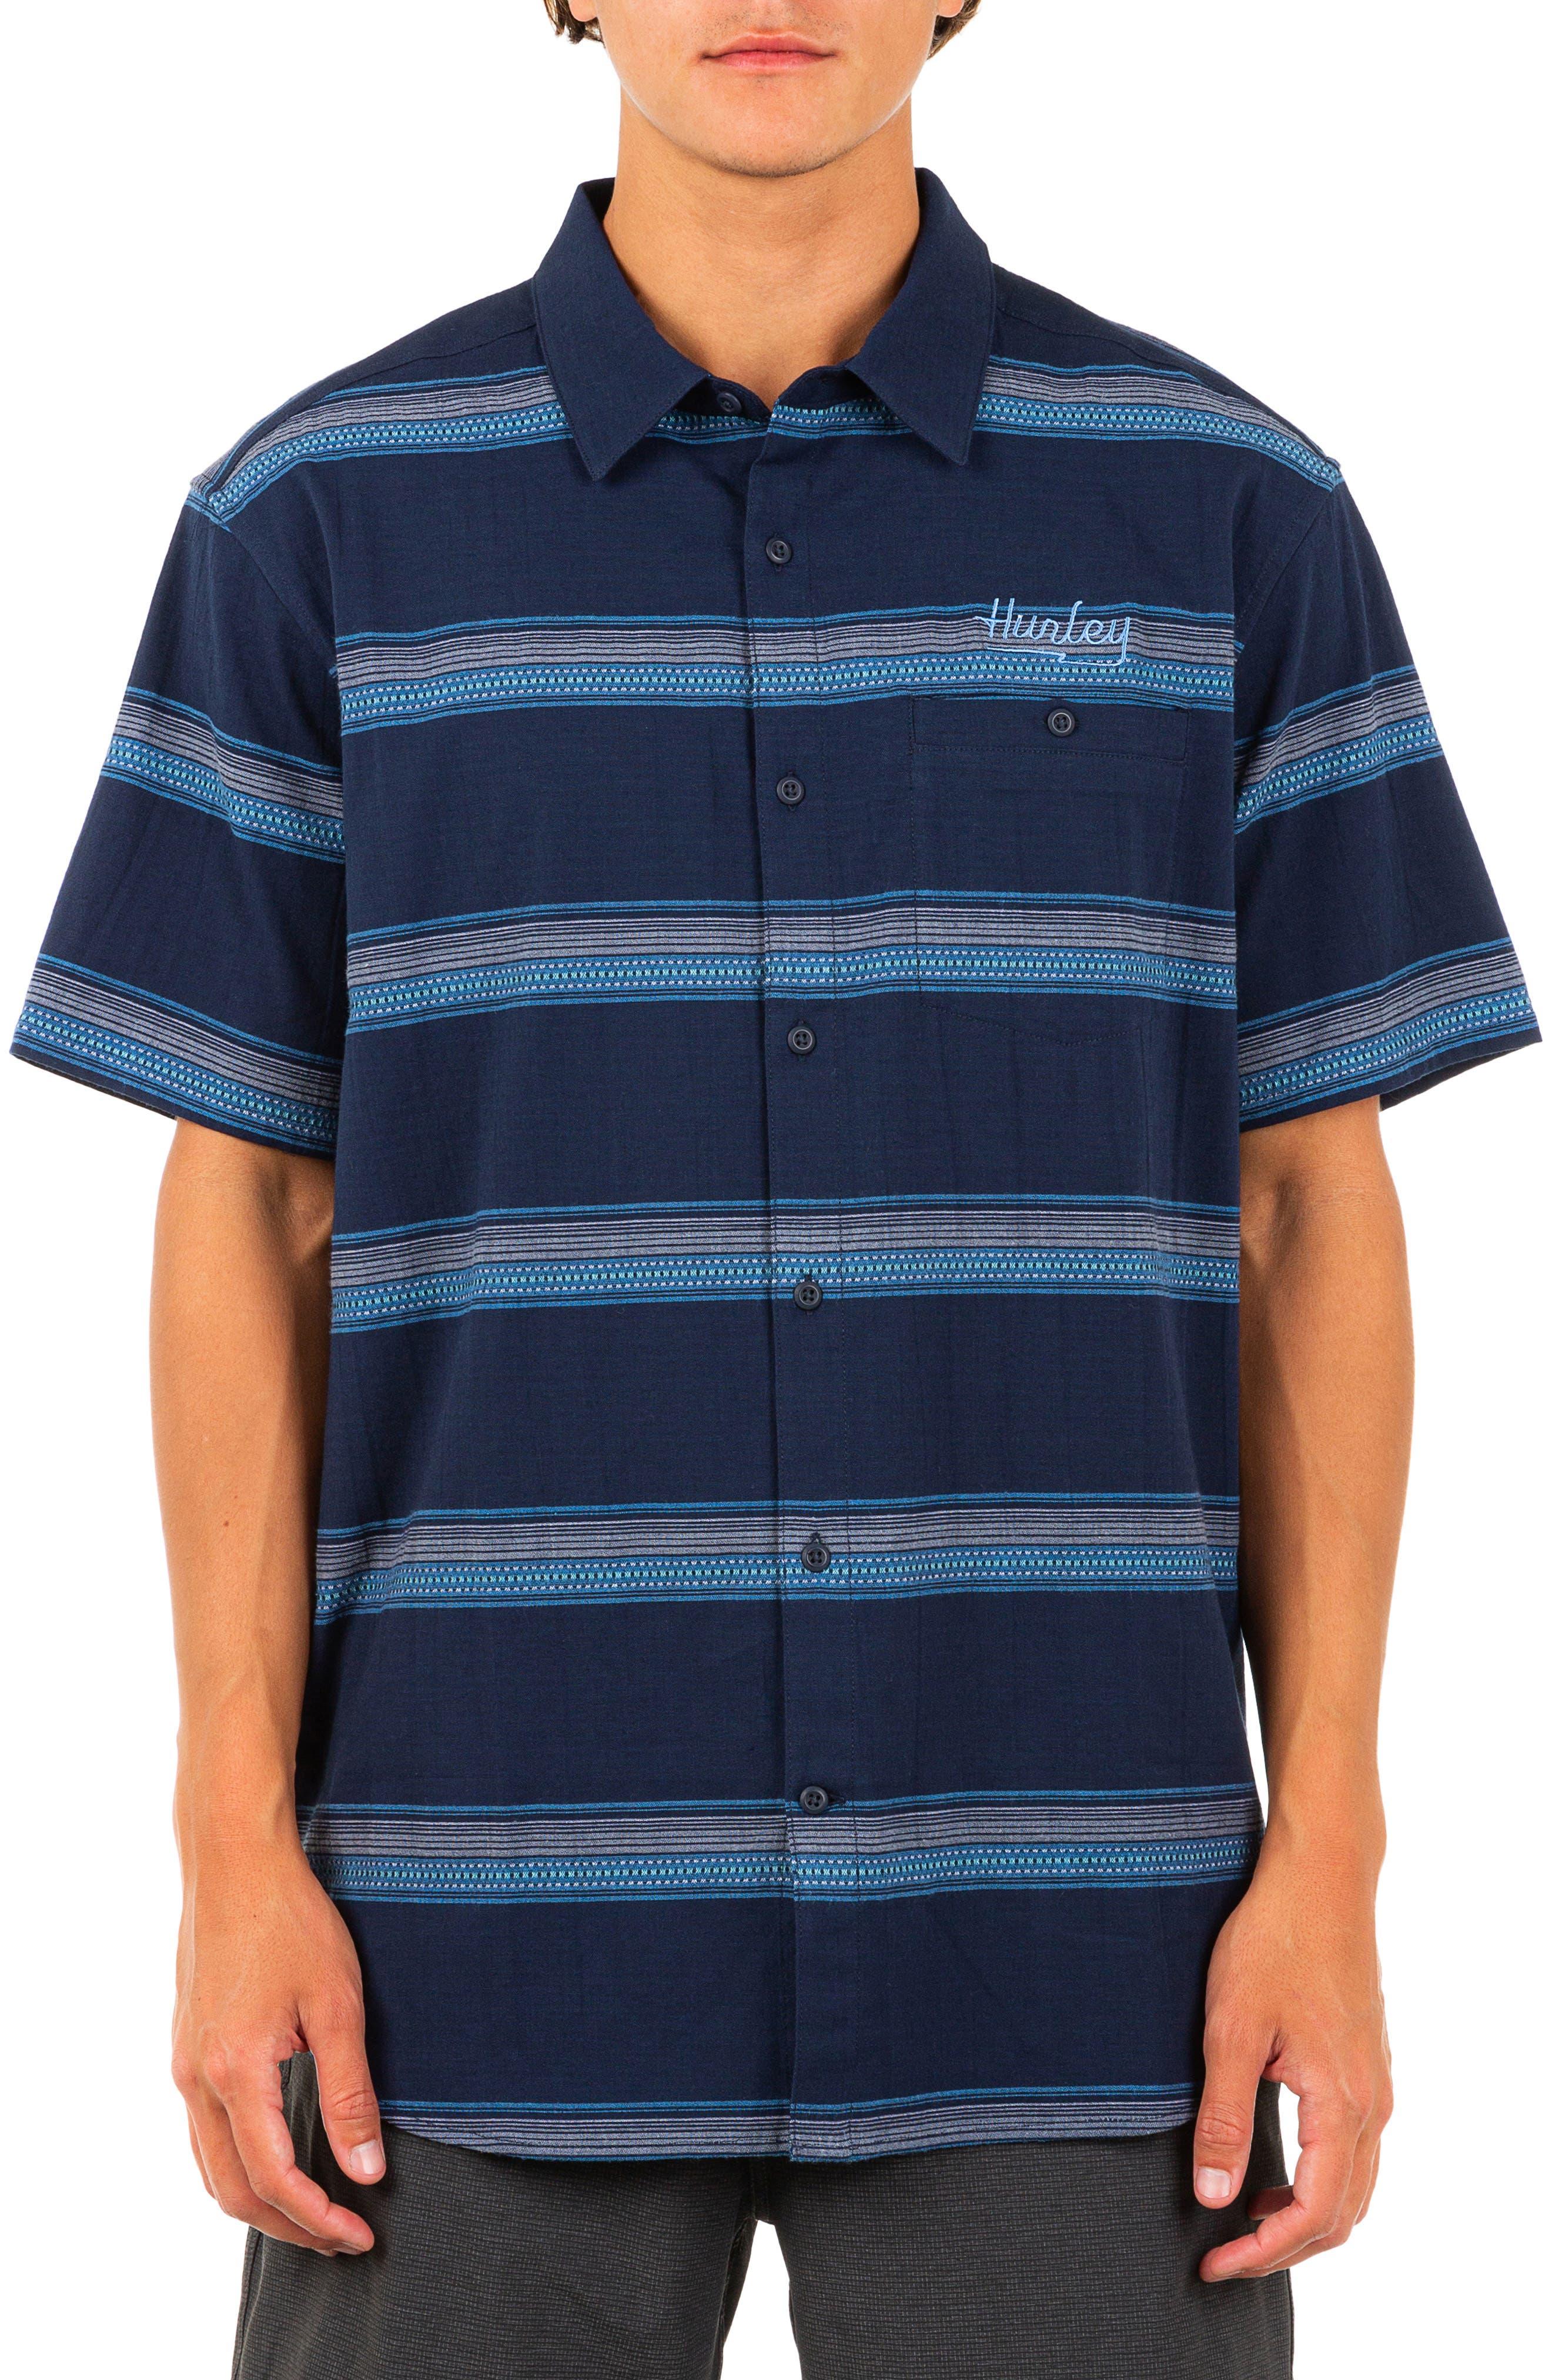 Miles Stretch Cotton Short Sleeve Button-Up Shirt